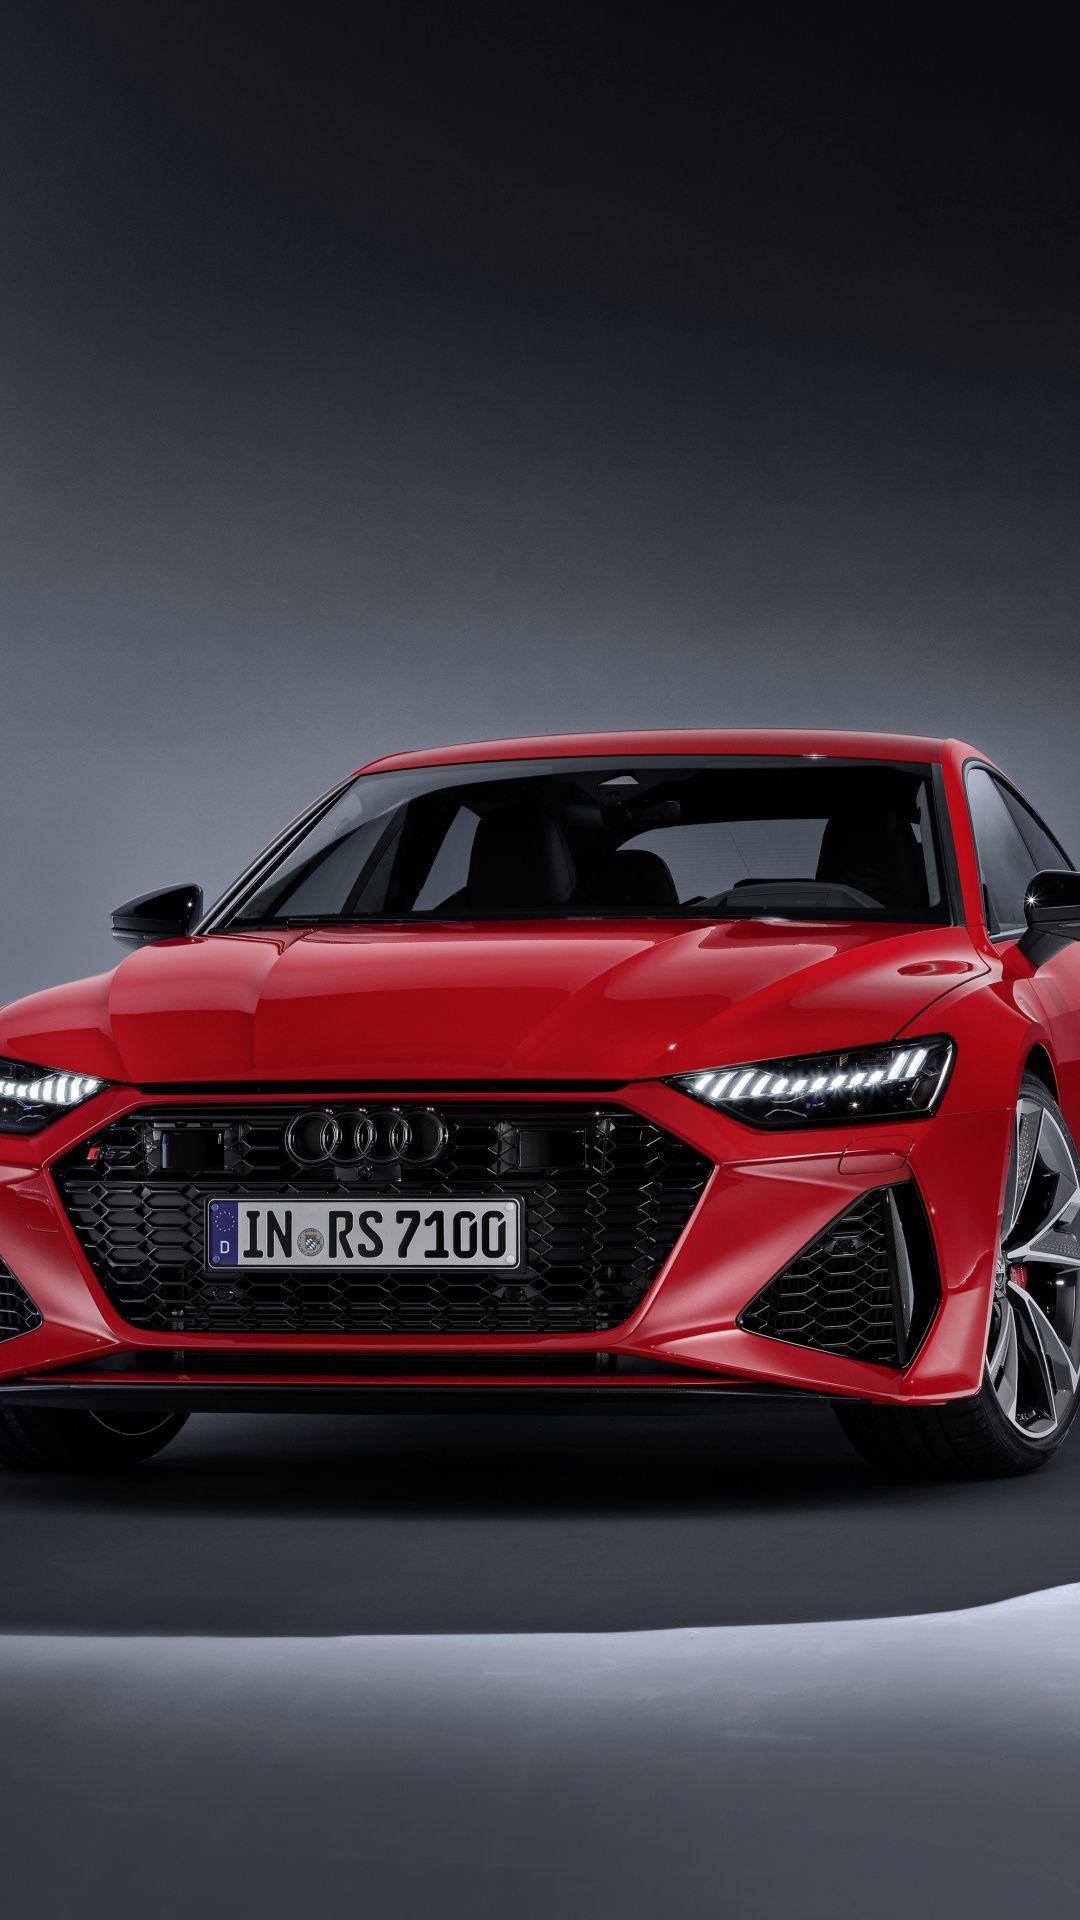 Audi Rs7 Wallpaper Iphone 3193485 Hd Wallpaper Backgrounds Download